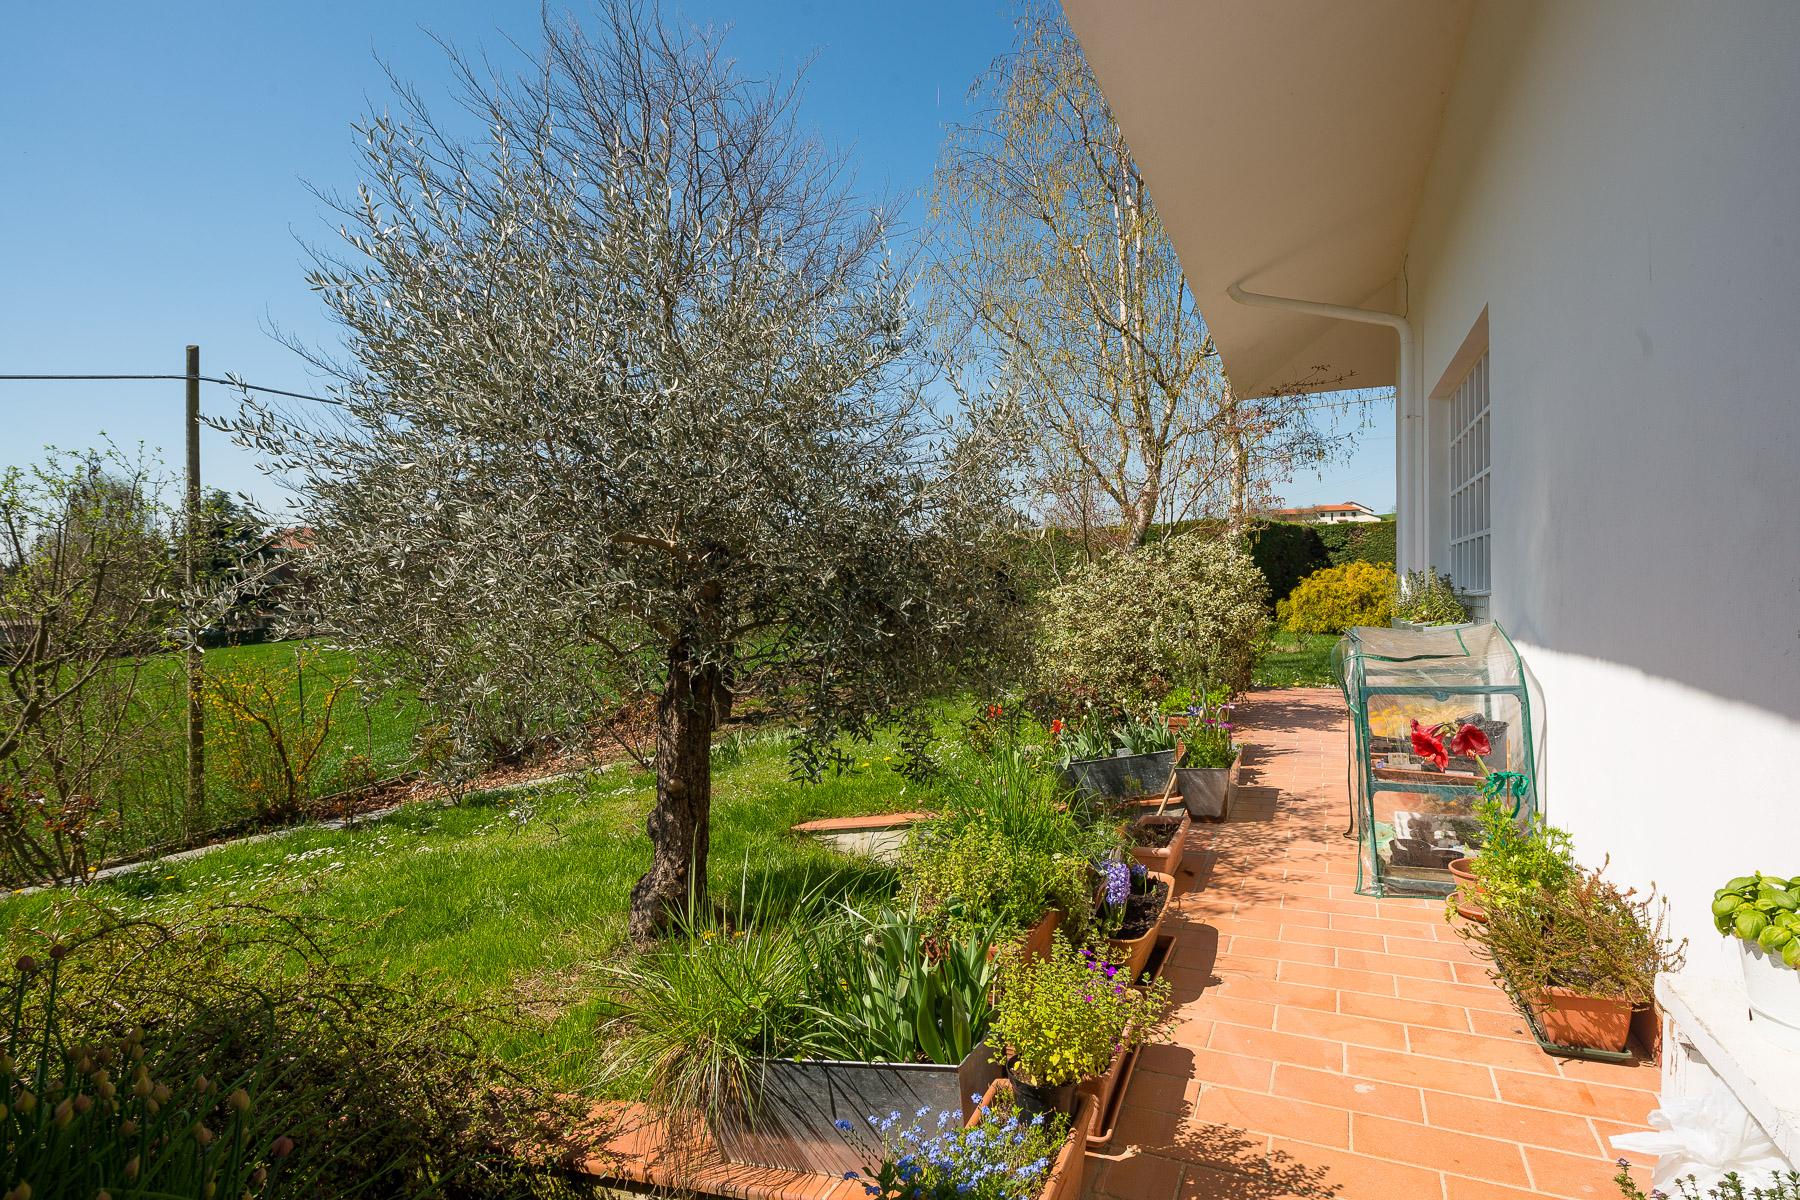 Villa in Vendita a Pino Torinese: 5 locali, 350 mq - Foto 22